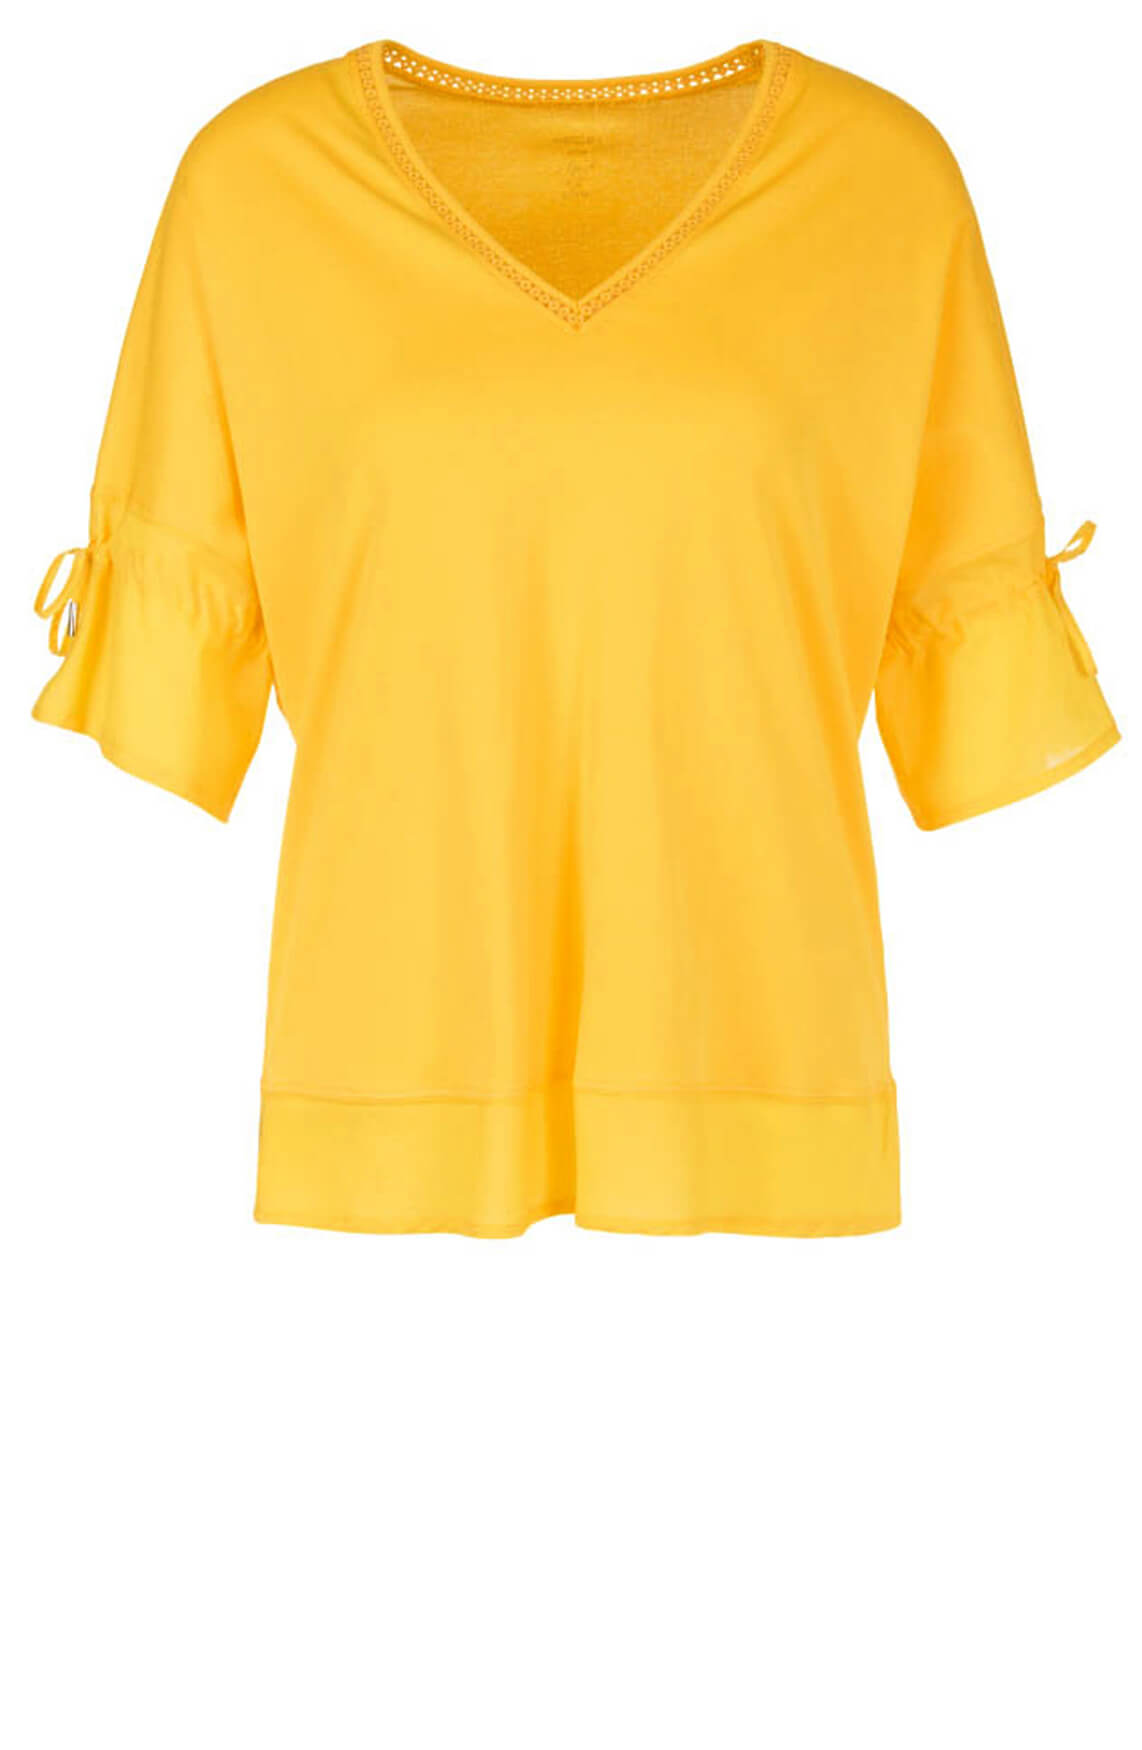 Marccain Dames Shirt met borduursel geel